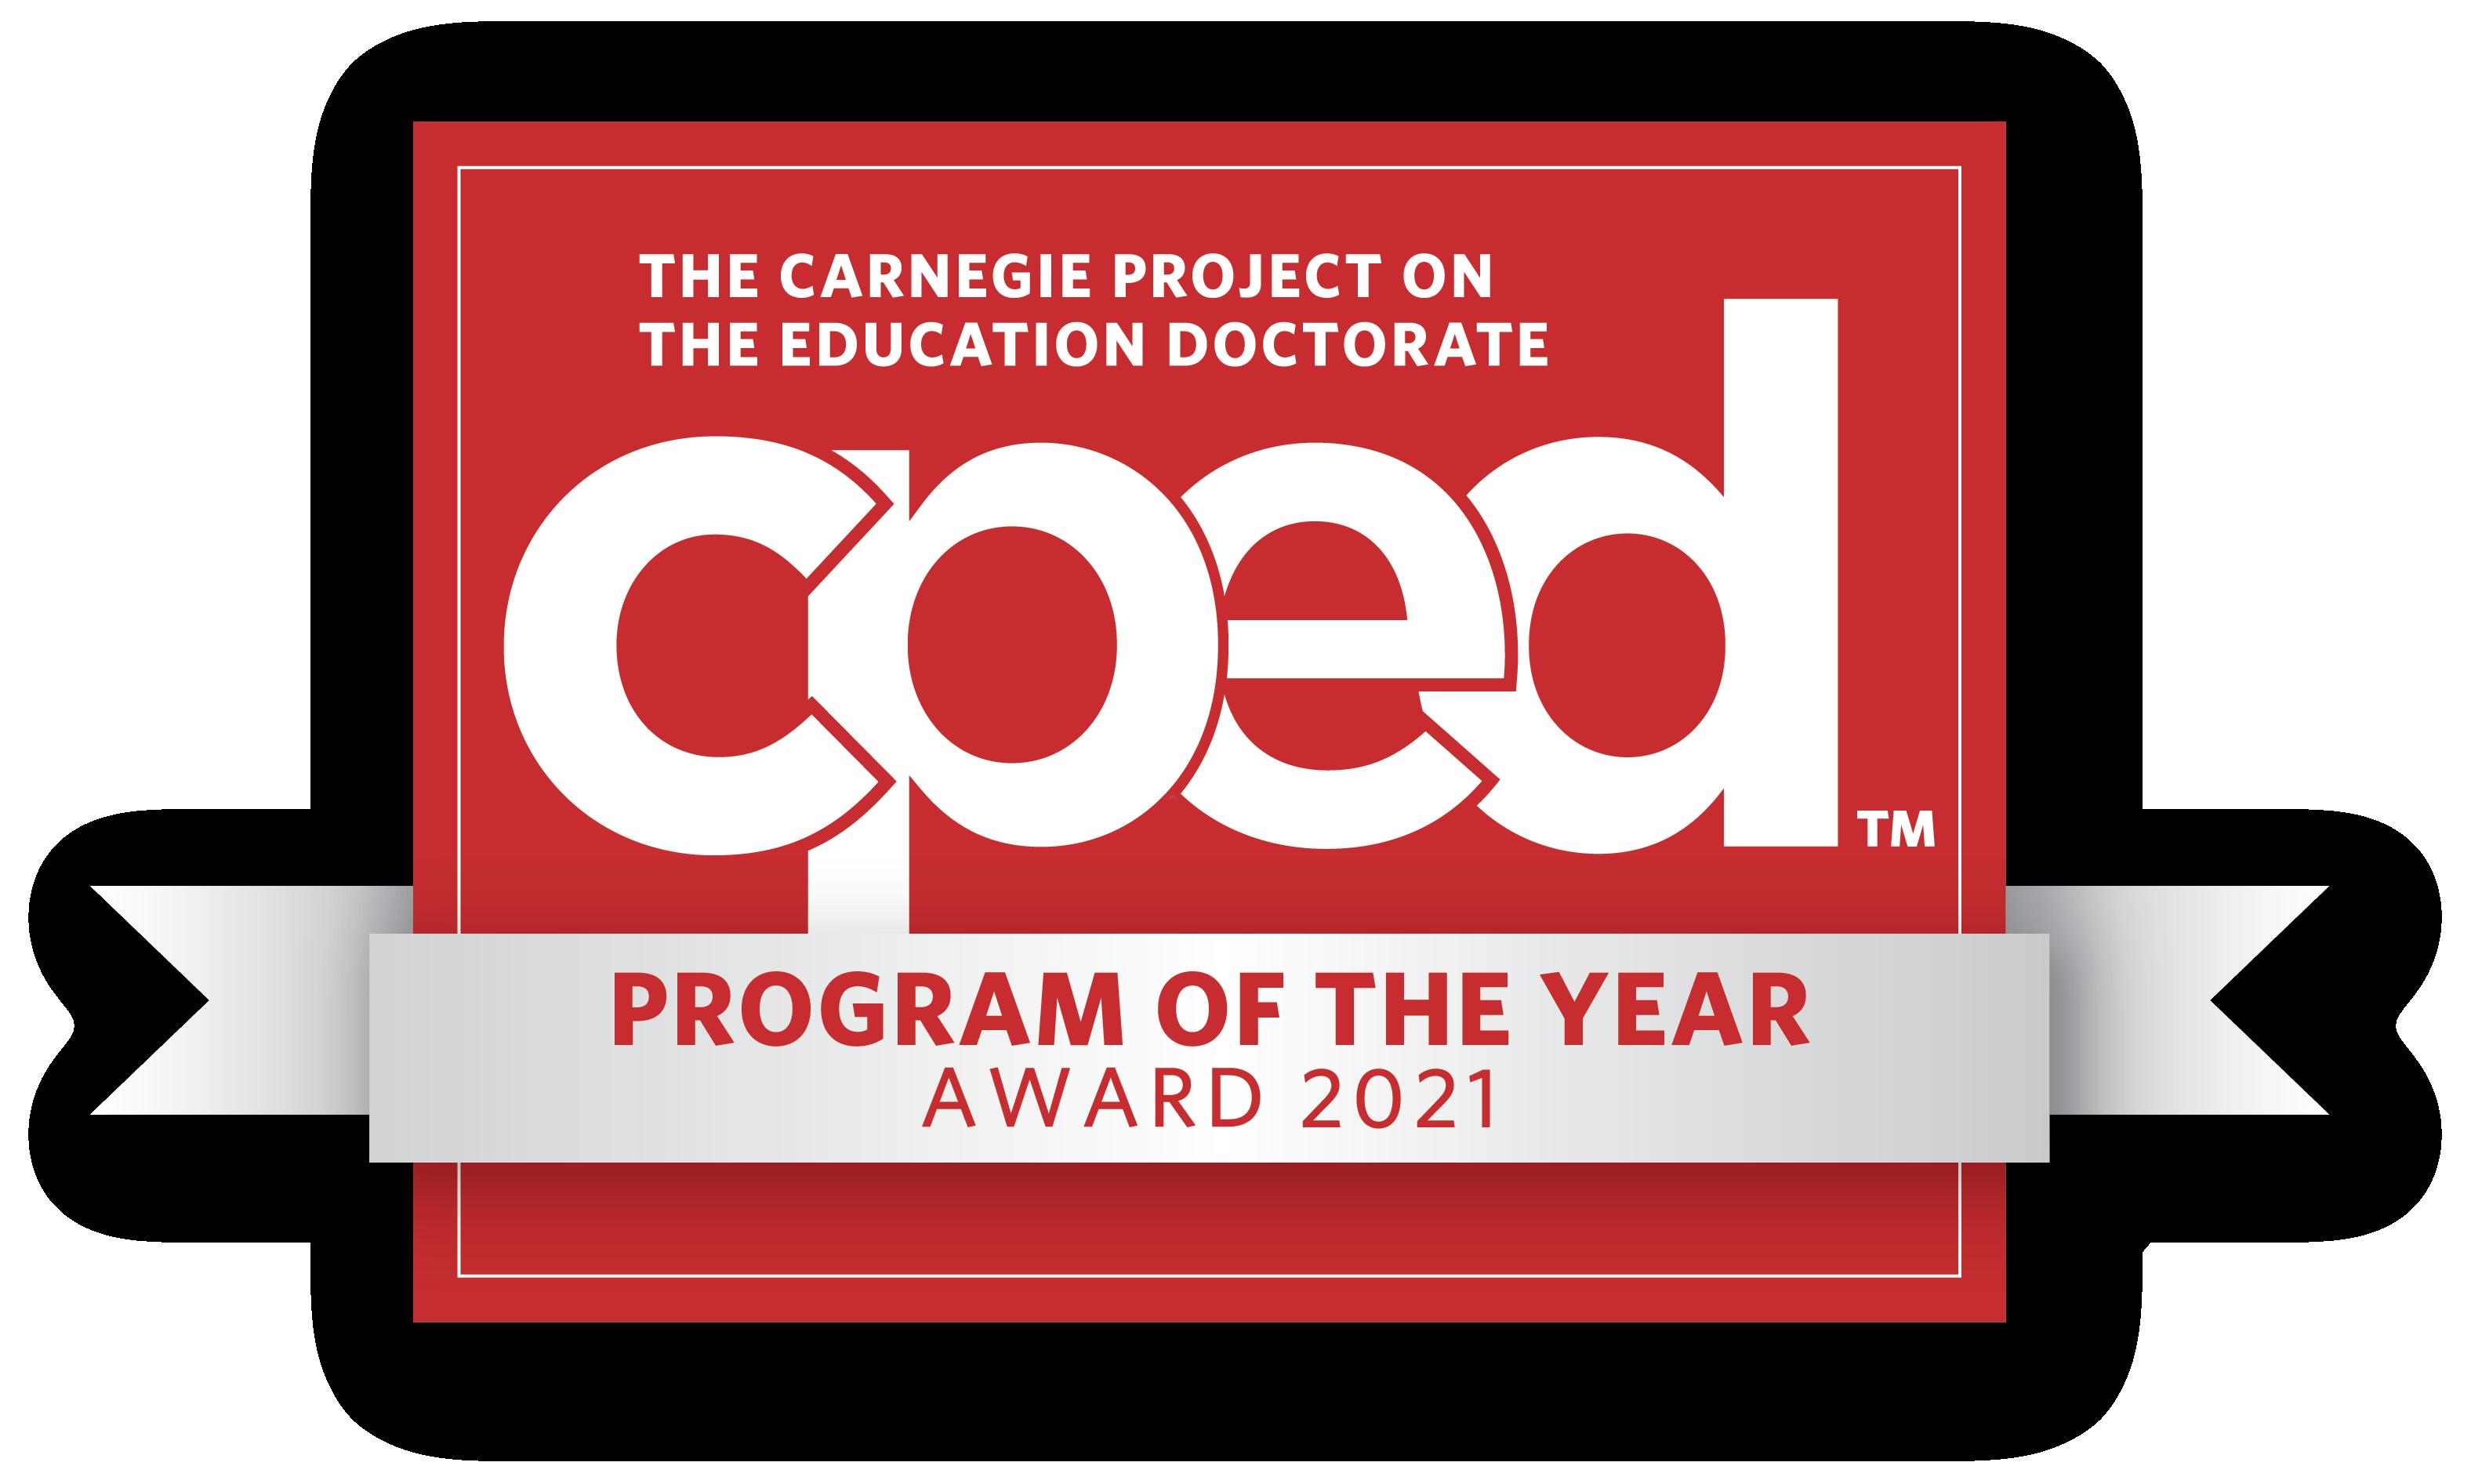 2021 CPED Program of the Year Award logo